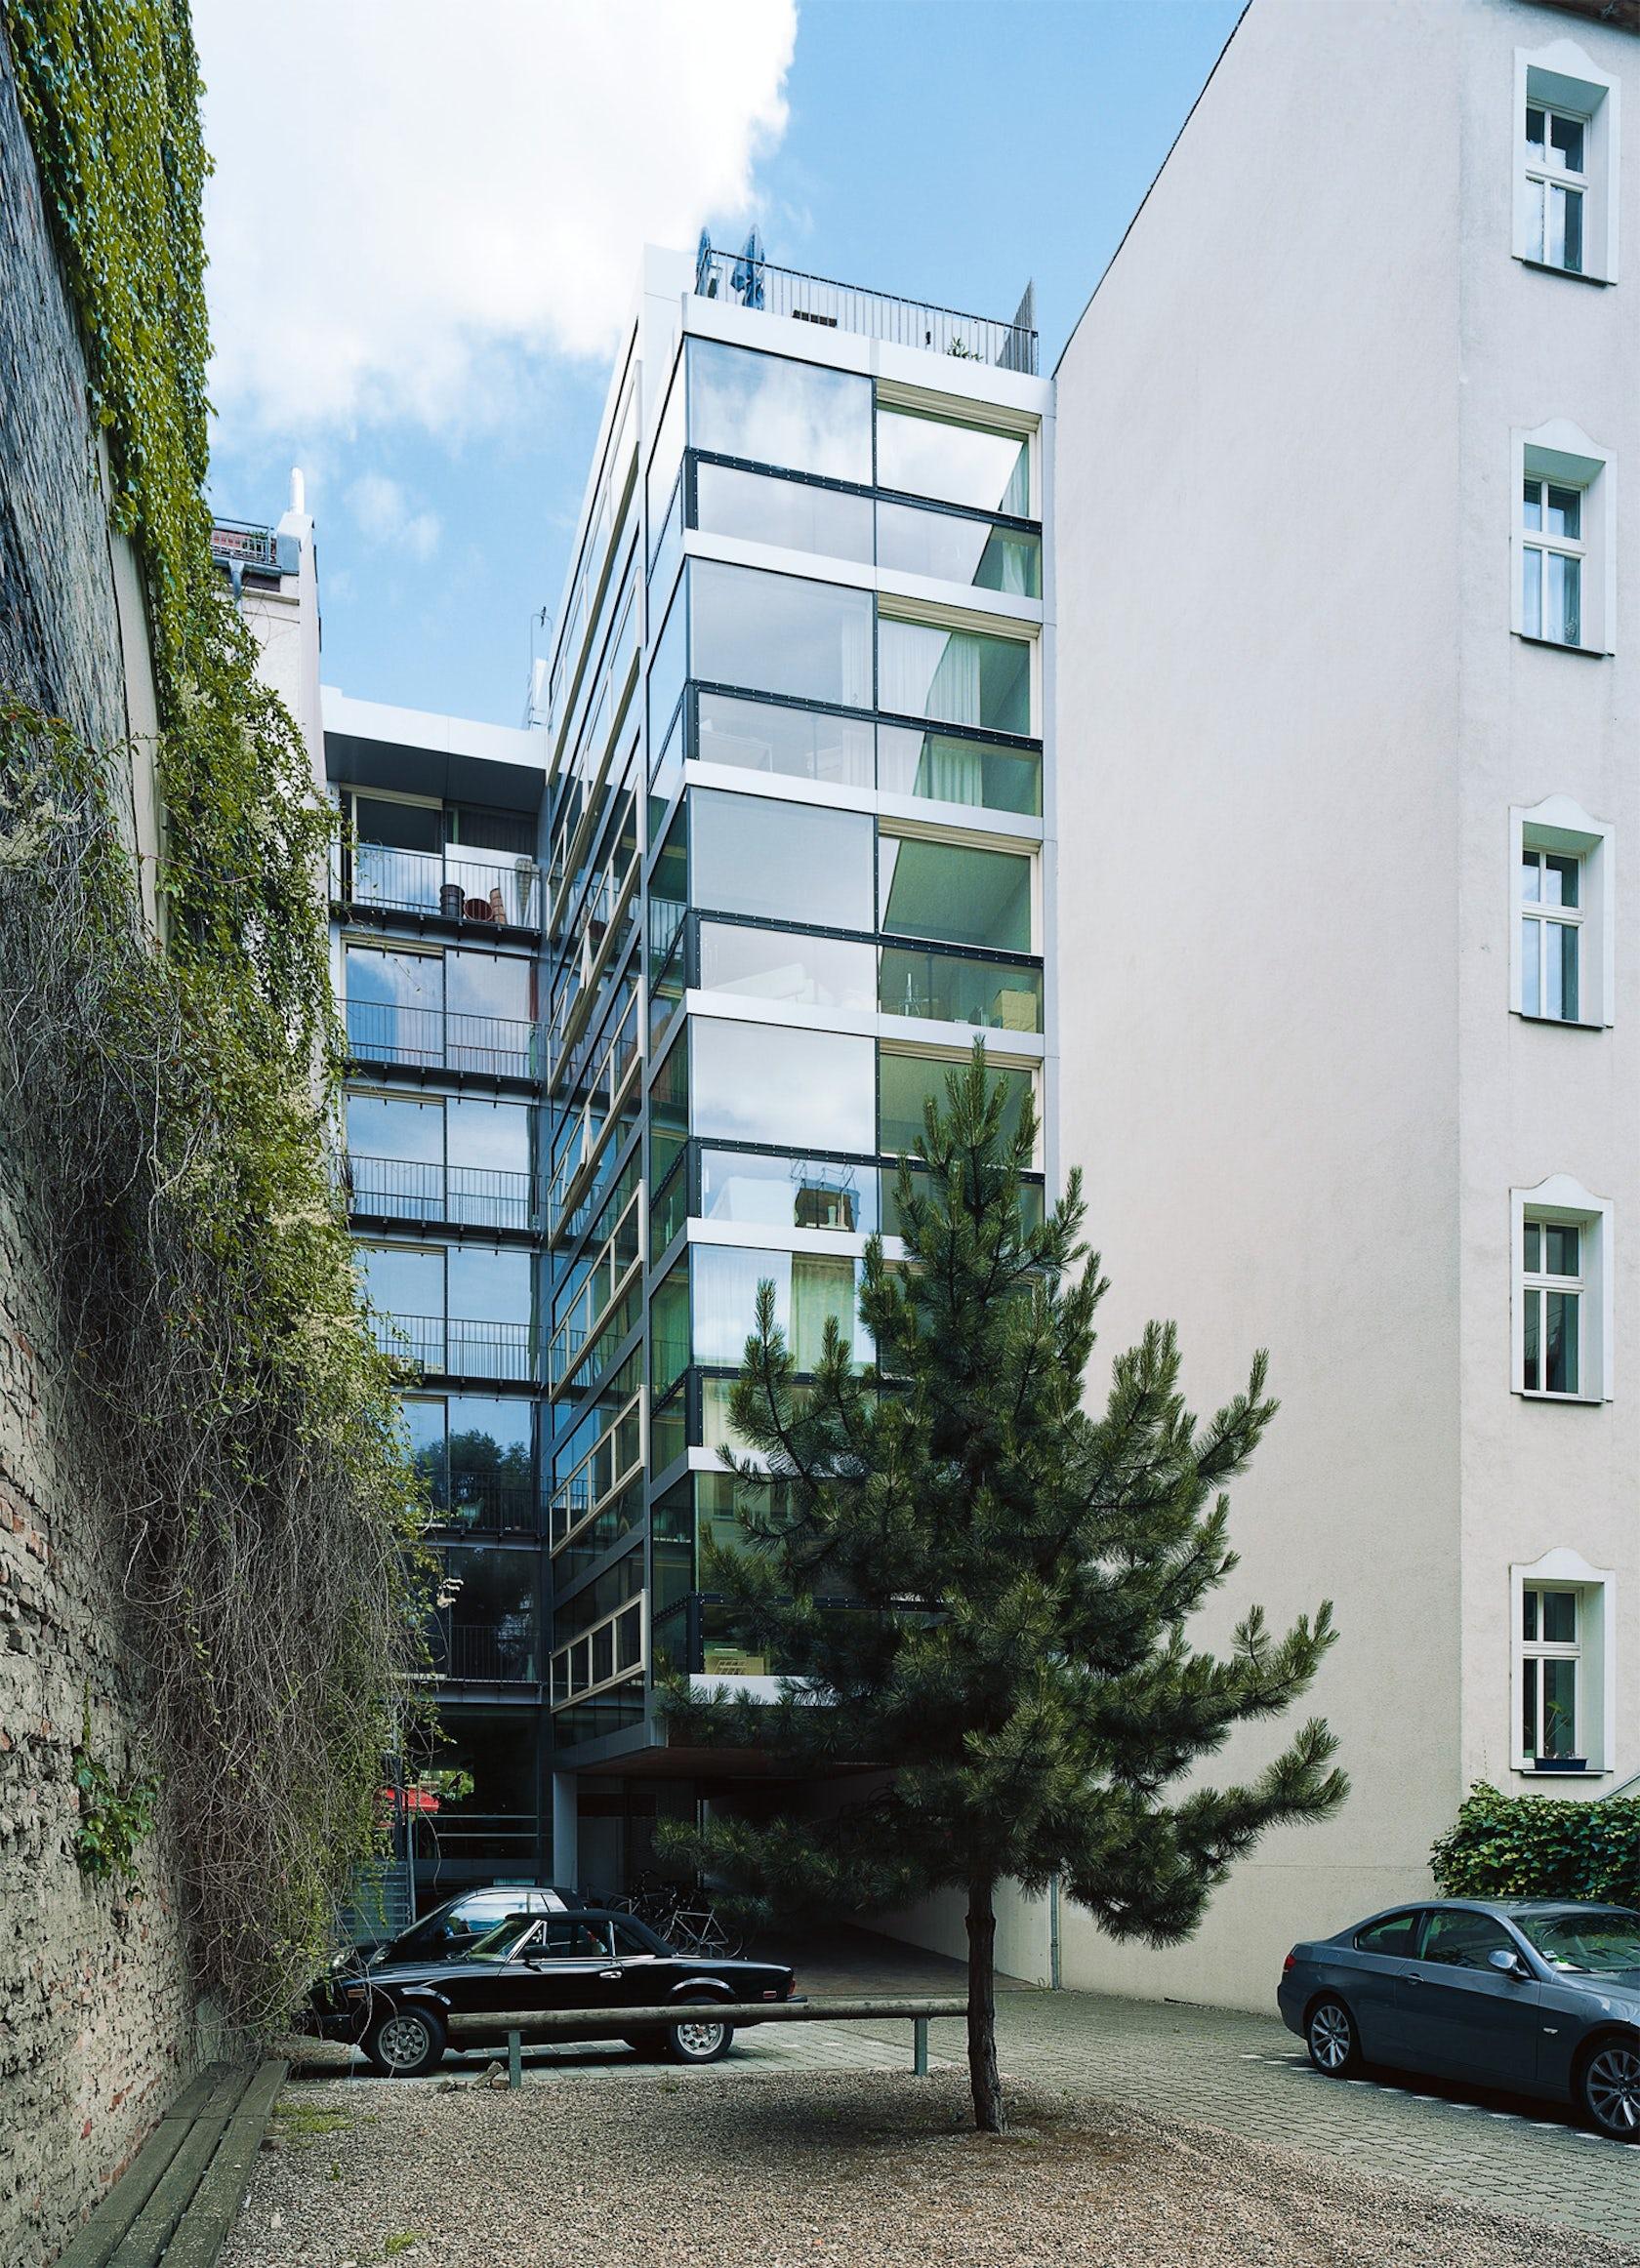 ly43 - New development of a residential building Lychener Strasse 43, Berlin-Prenzlauer  Berg on Architizer